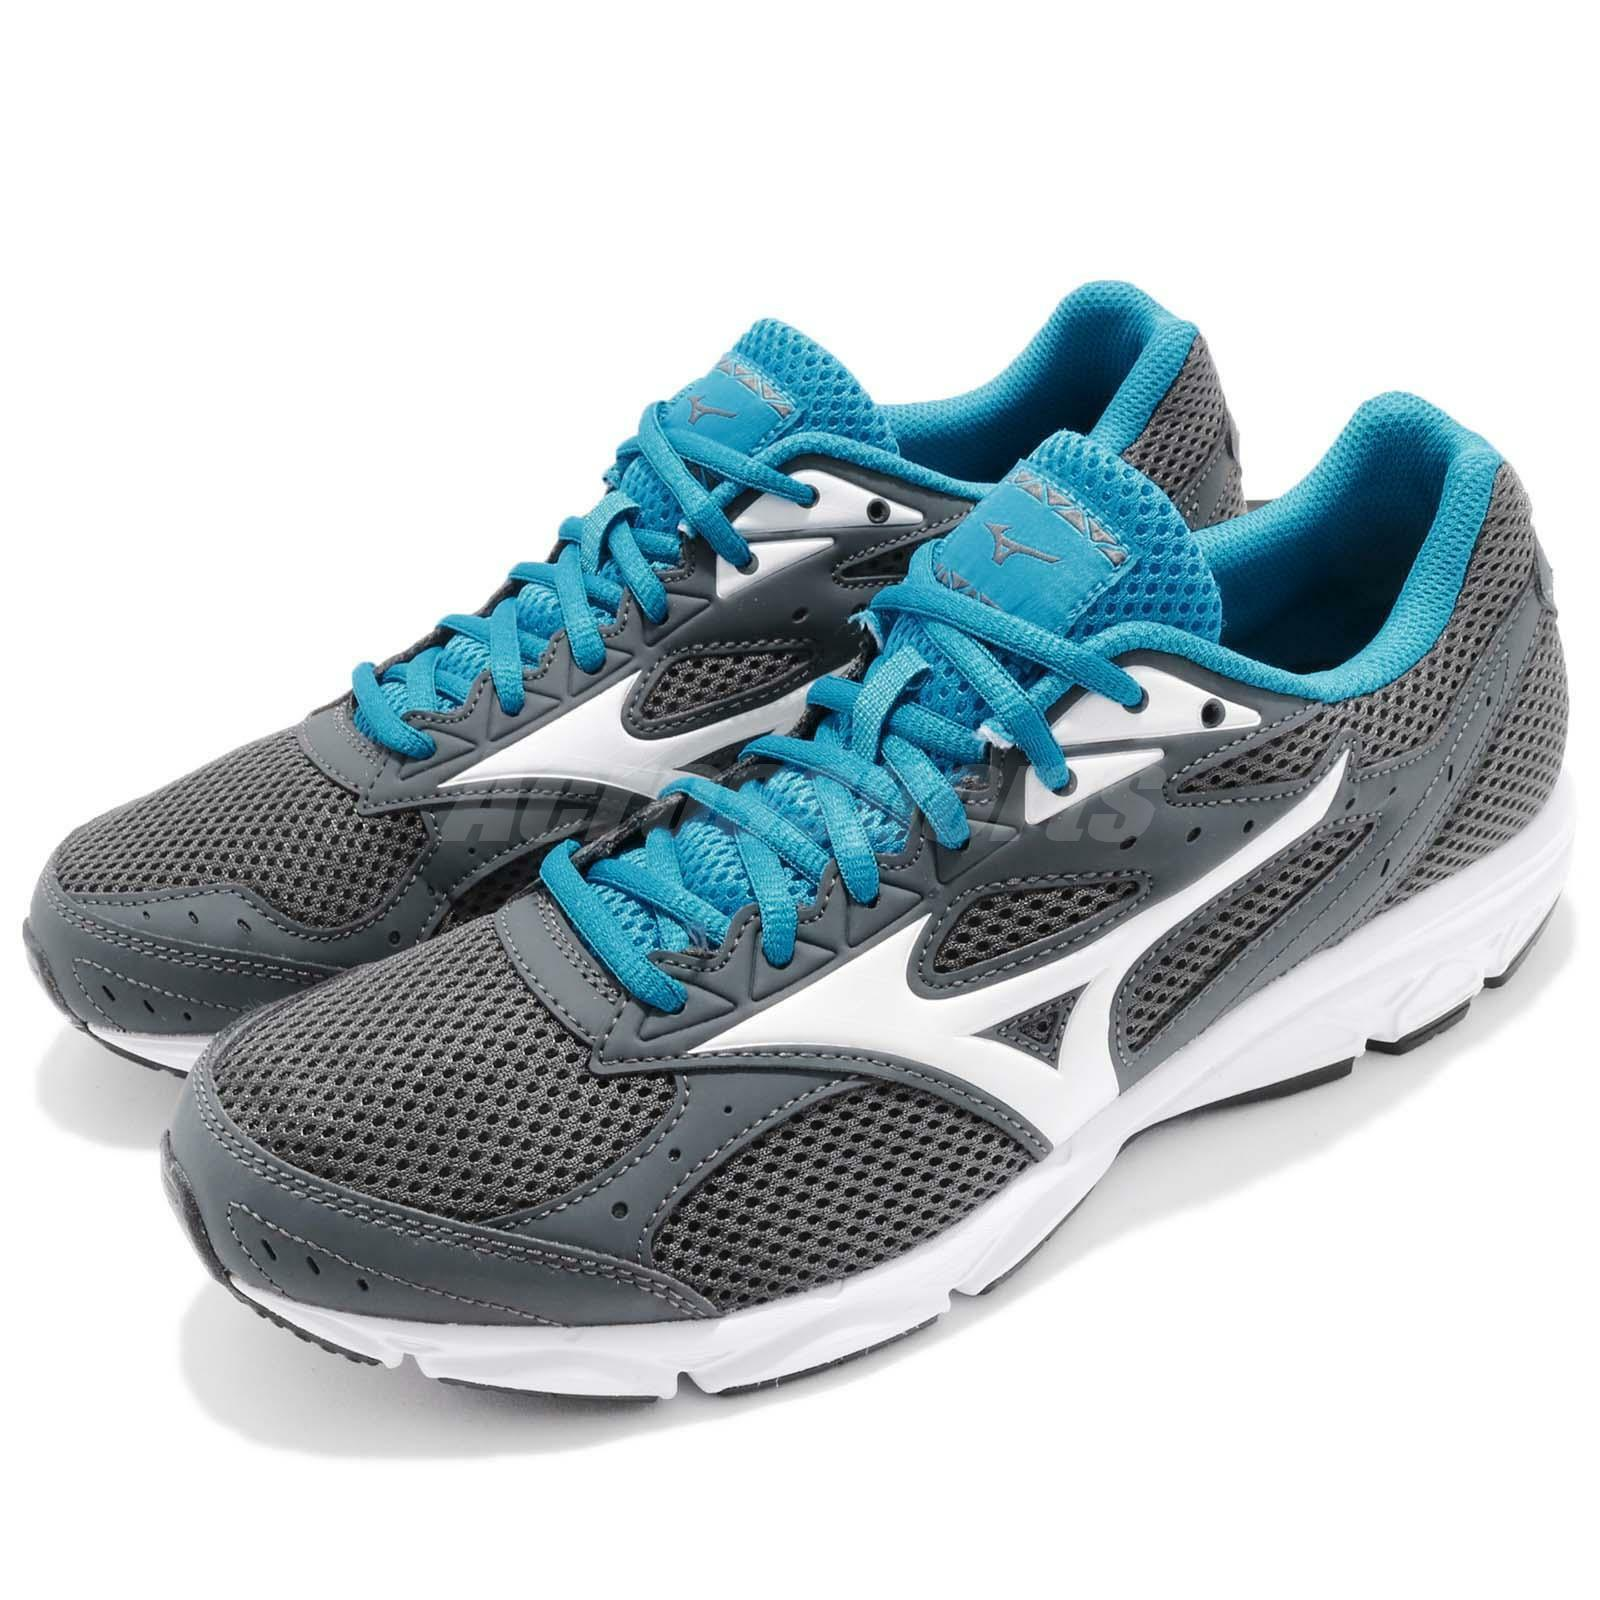 Mizuno Spark 3 3 3 III grigio bianca blu Uomo Running scarpe scarpe da ginnastica K1GA1803-01 12f9d5